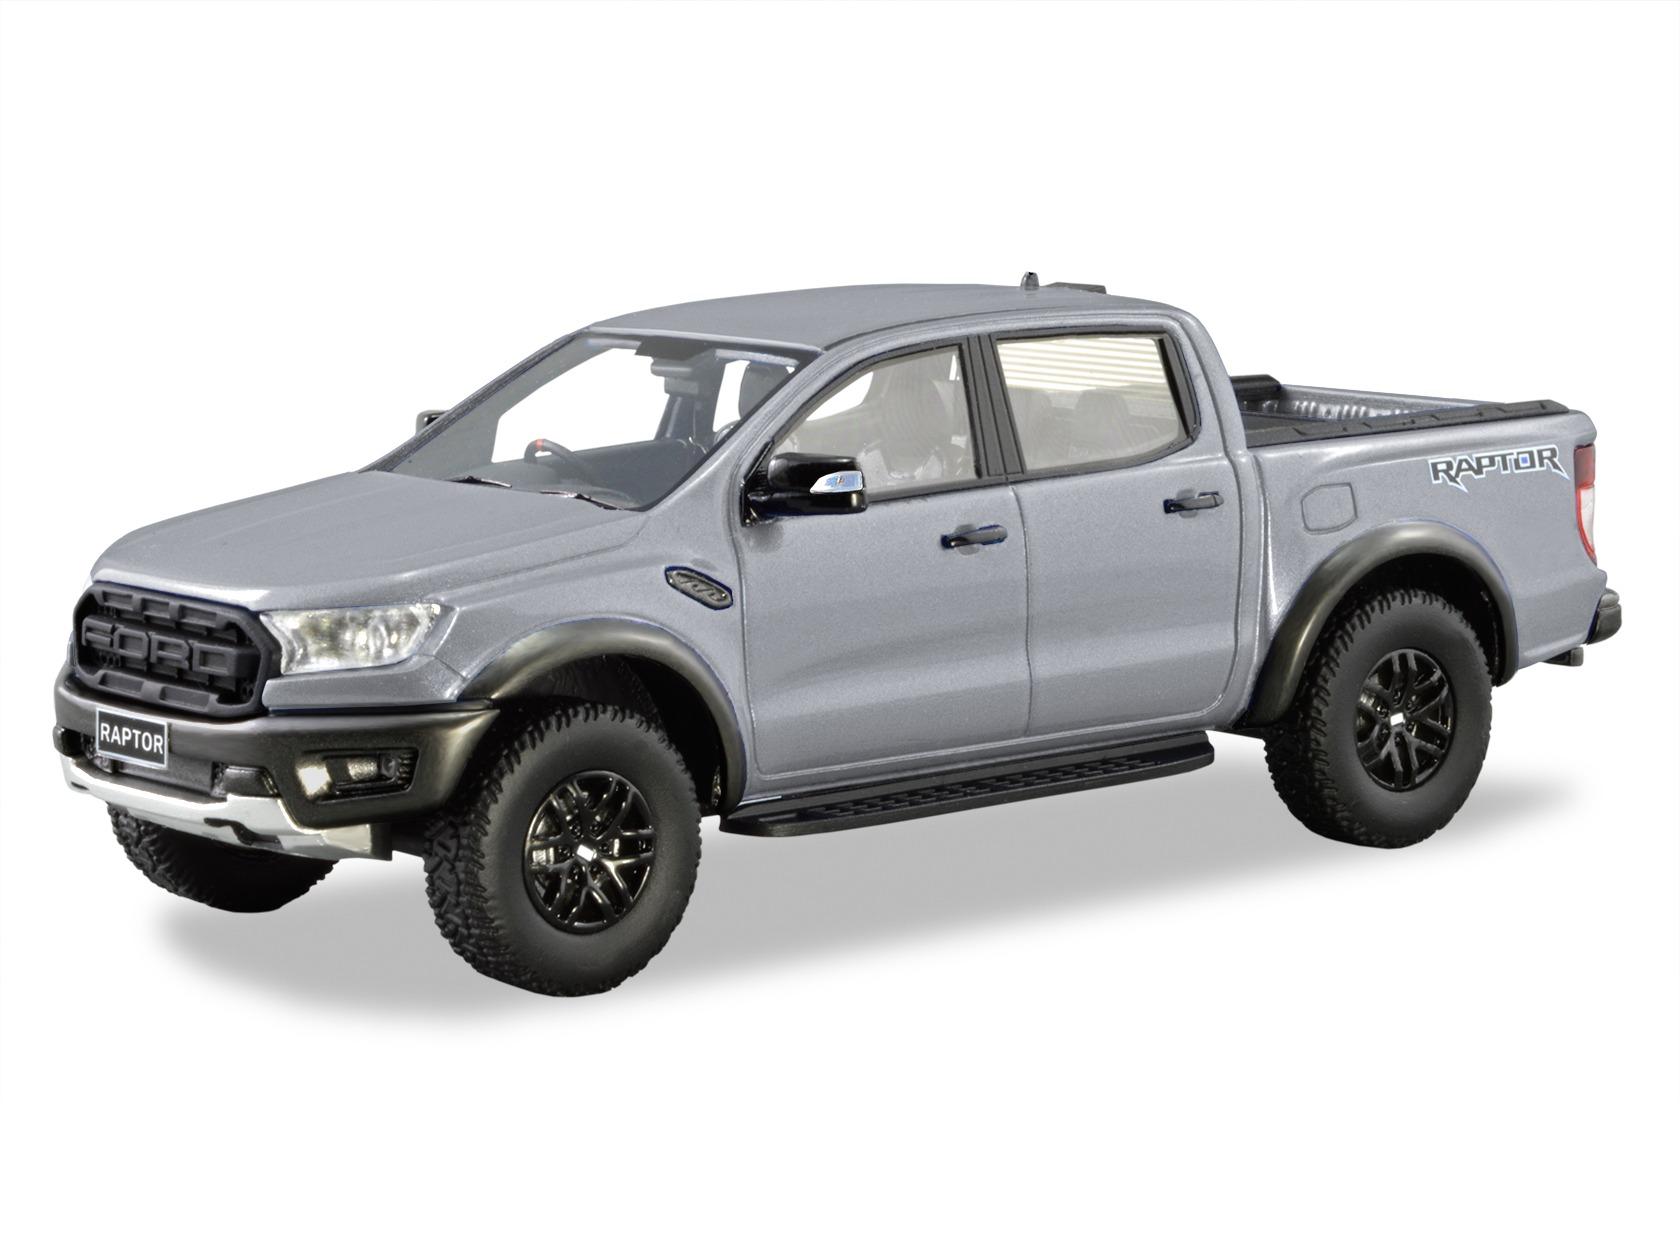 2019 Ford Ranger Raptor – Grey